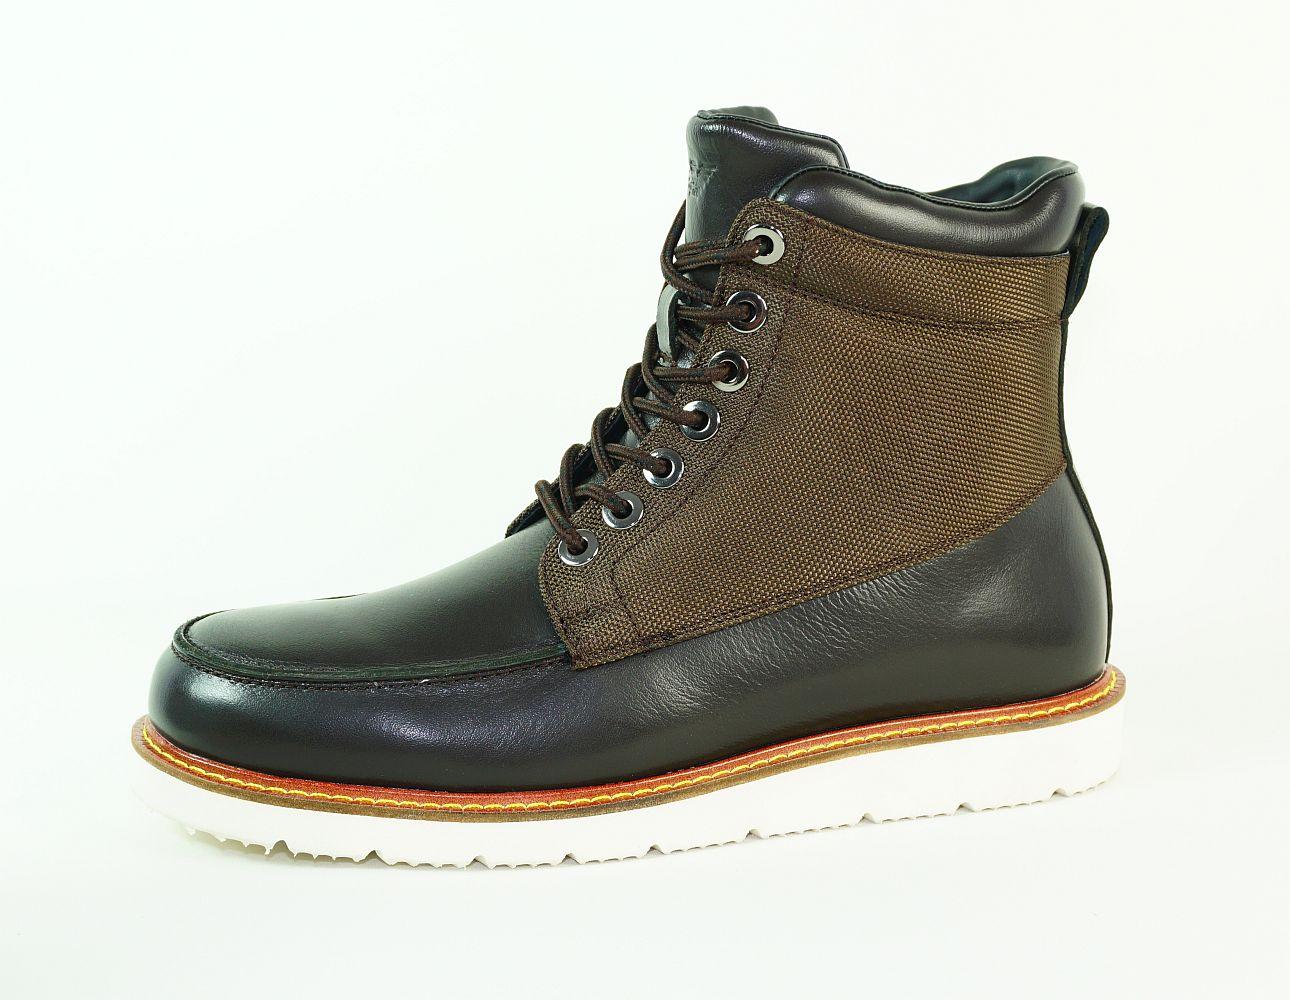 Armani Jeans Schuhe Stiefel Boot braun 935052 6A452 04552 Brown After DA HW16-AJ